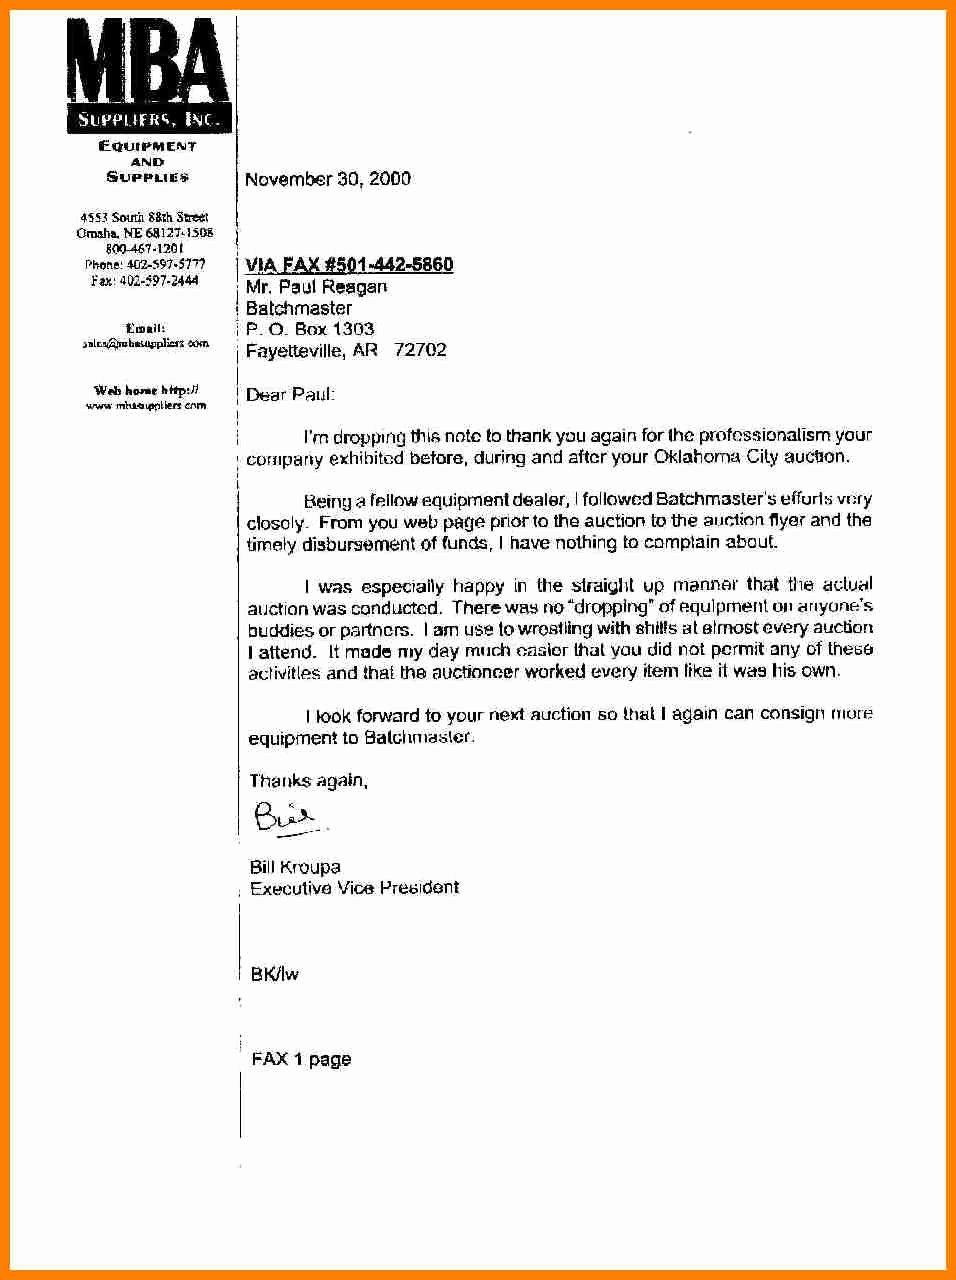 Harvard Letter Of Recommendation Best Of 7 Harvard Business School Letter Of Re Mendation